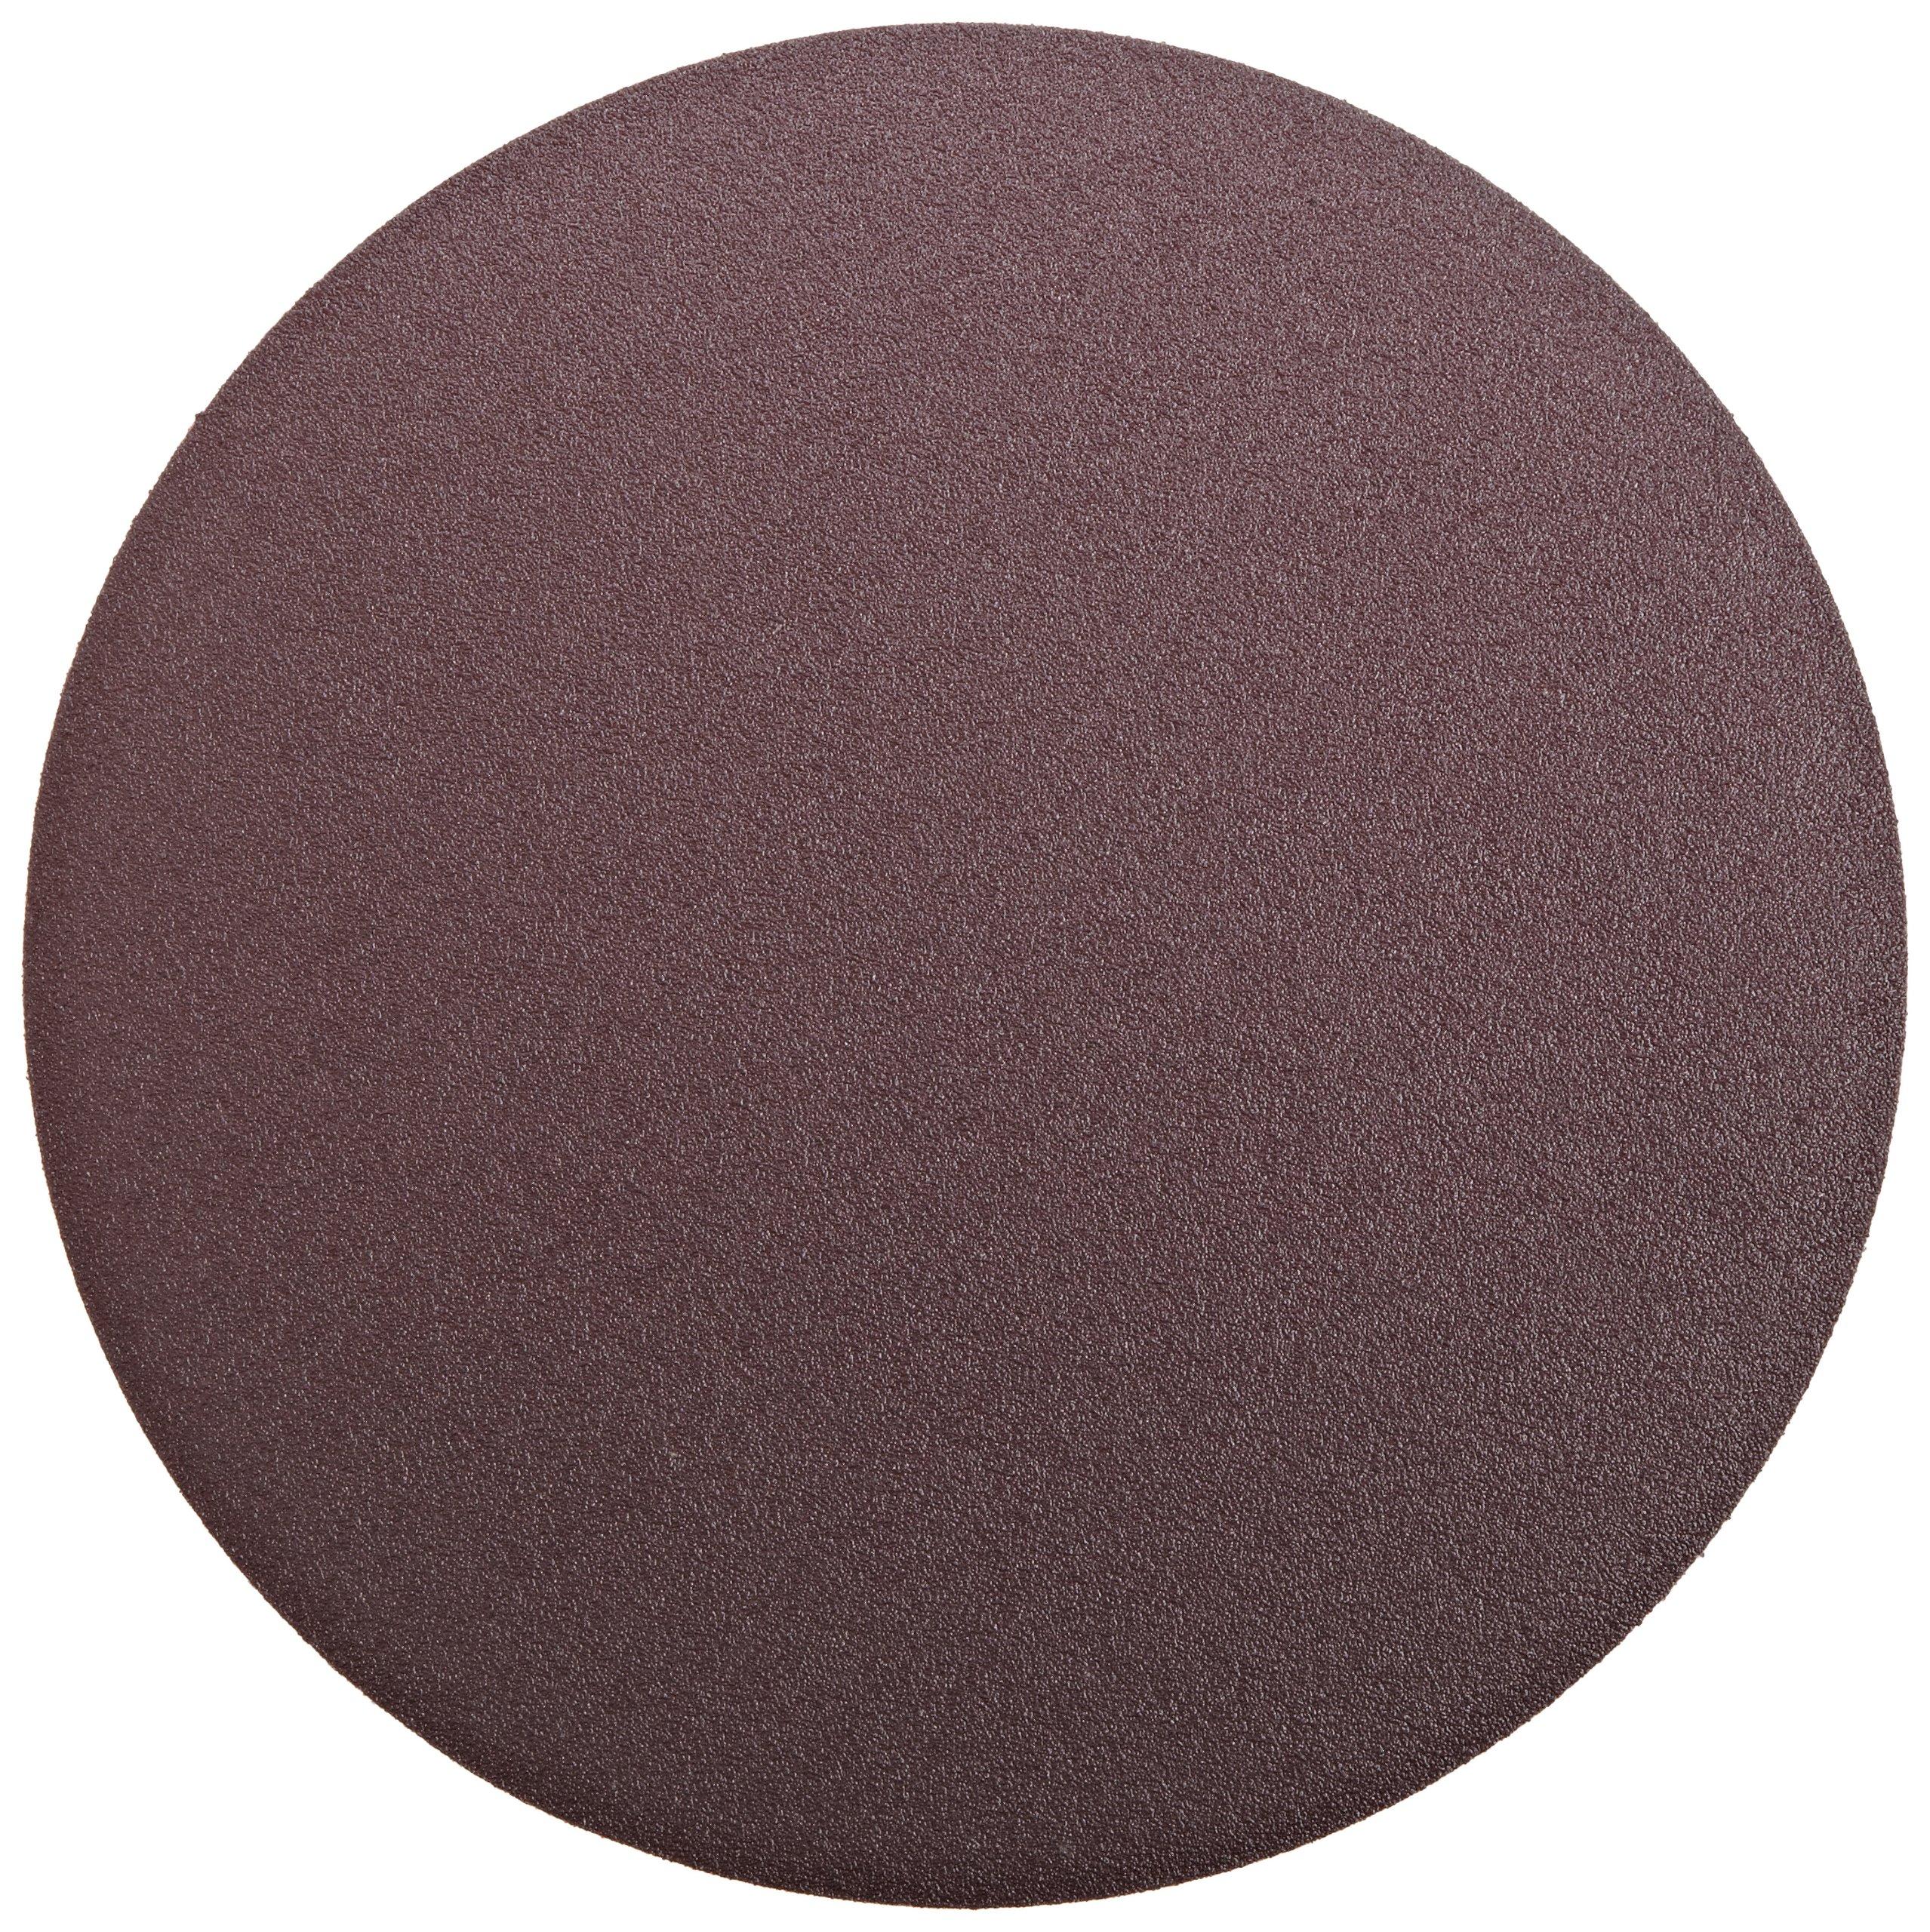 3M  PSA Cloth Disc 348D, X Weight Cloth, PSA Attachment, Aluminum Oxide, 12'' Diameter, 60 Grit, Brown (Pack of 10)